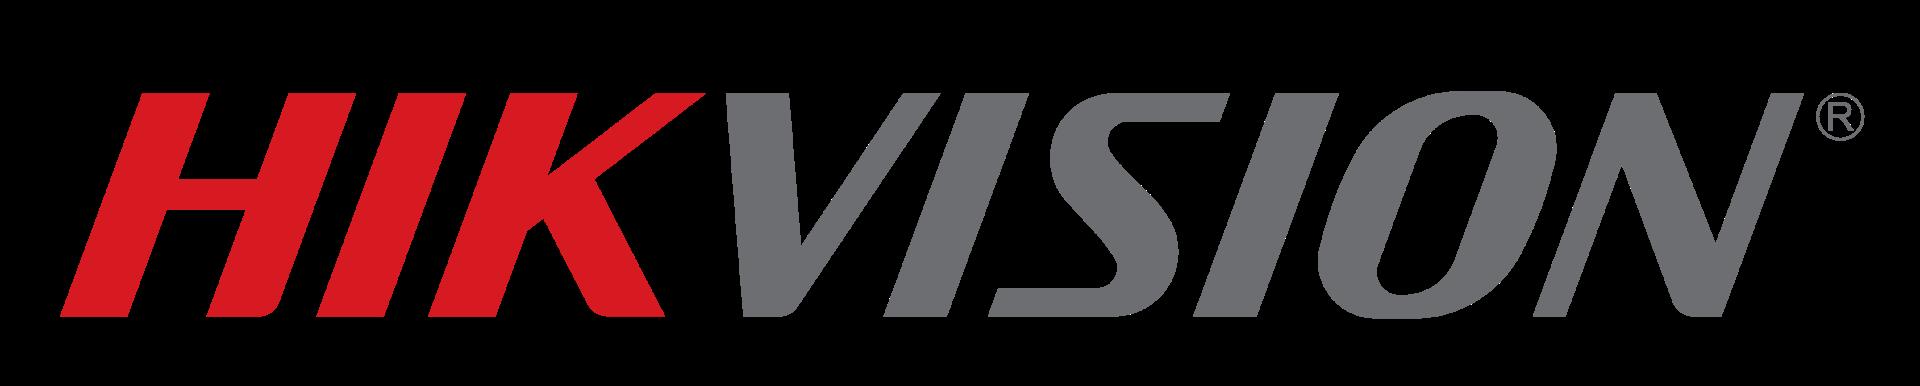 hikvision logotipas